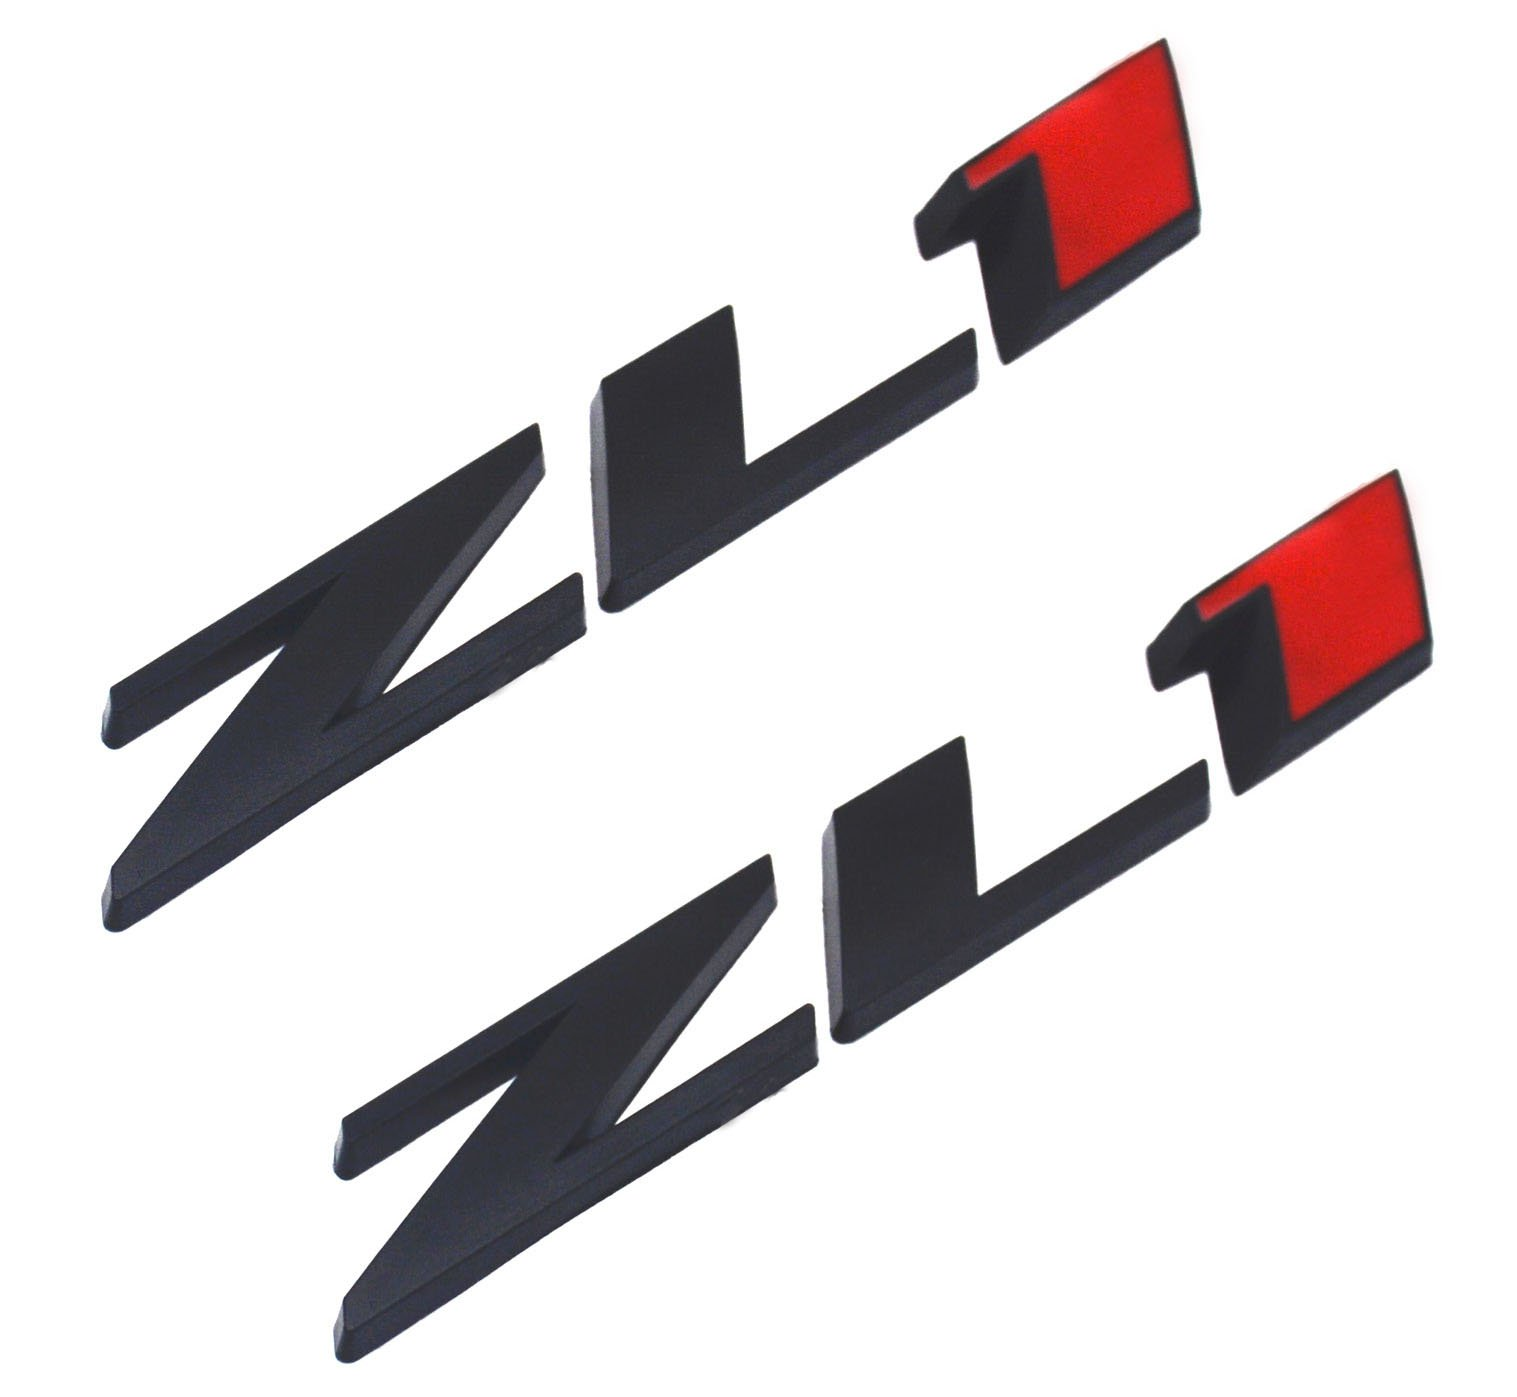 Yoaoo 1x Genuine Camaro ZL1 emblem badge letter Rear Side ZL1 Door OEM 1 Chrome Red